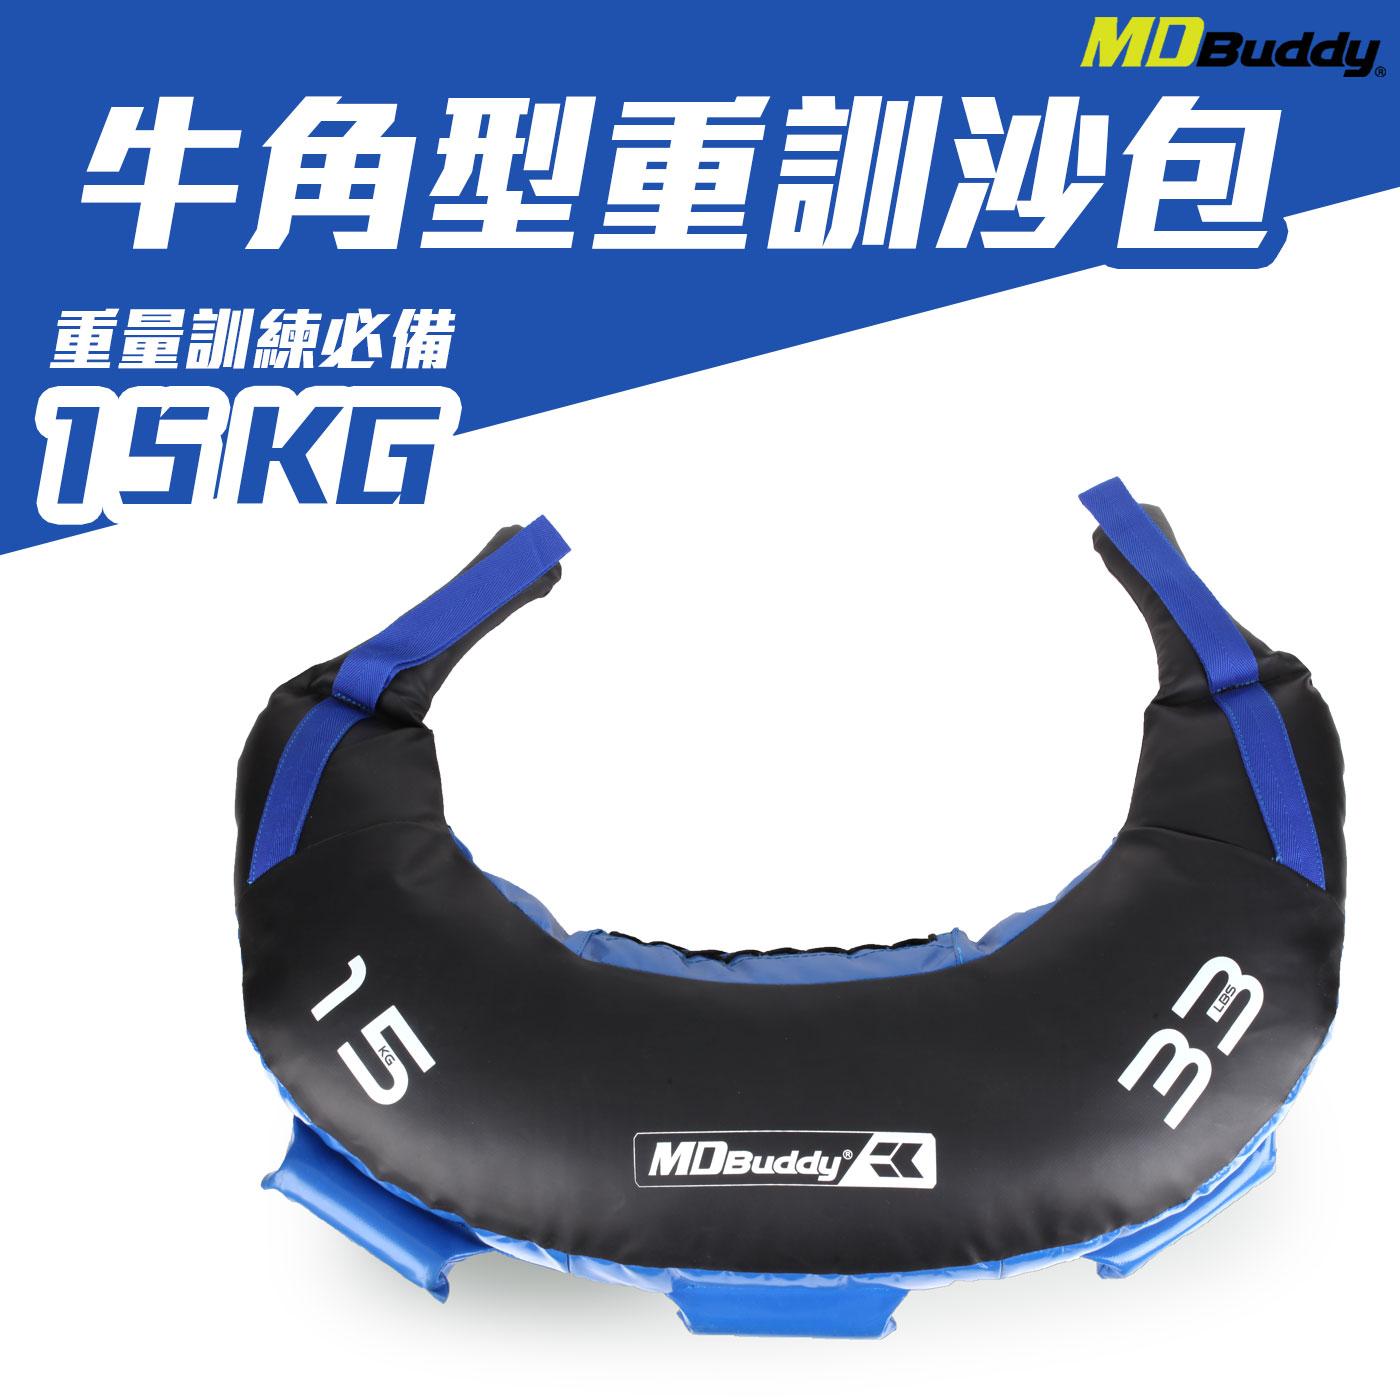 MDBuddy (15KG)牛角型重量訓練沙包 6017301